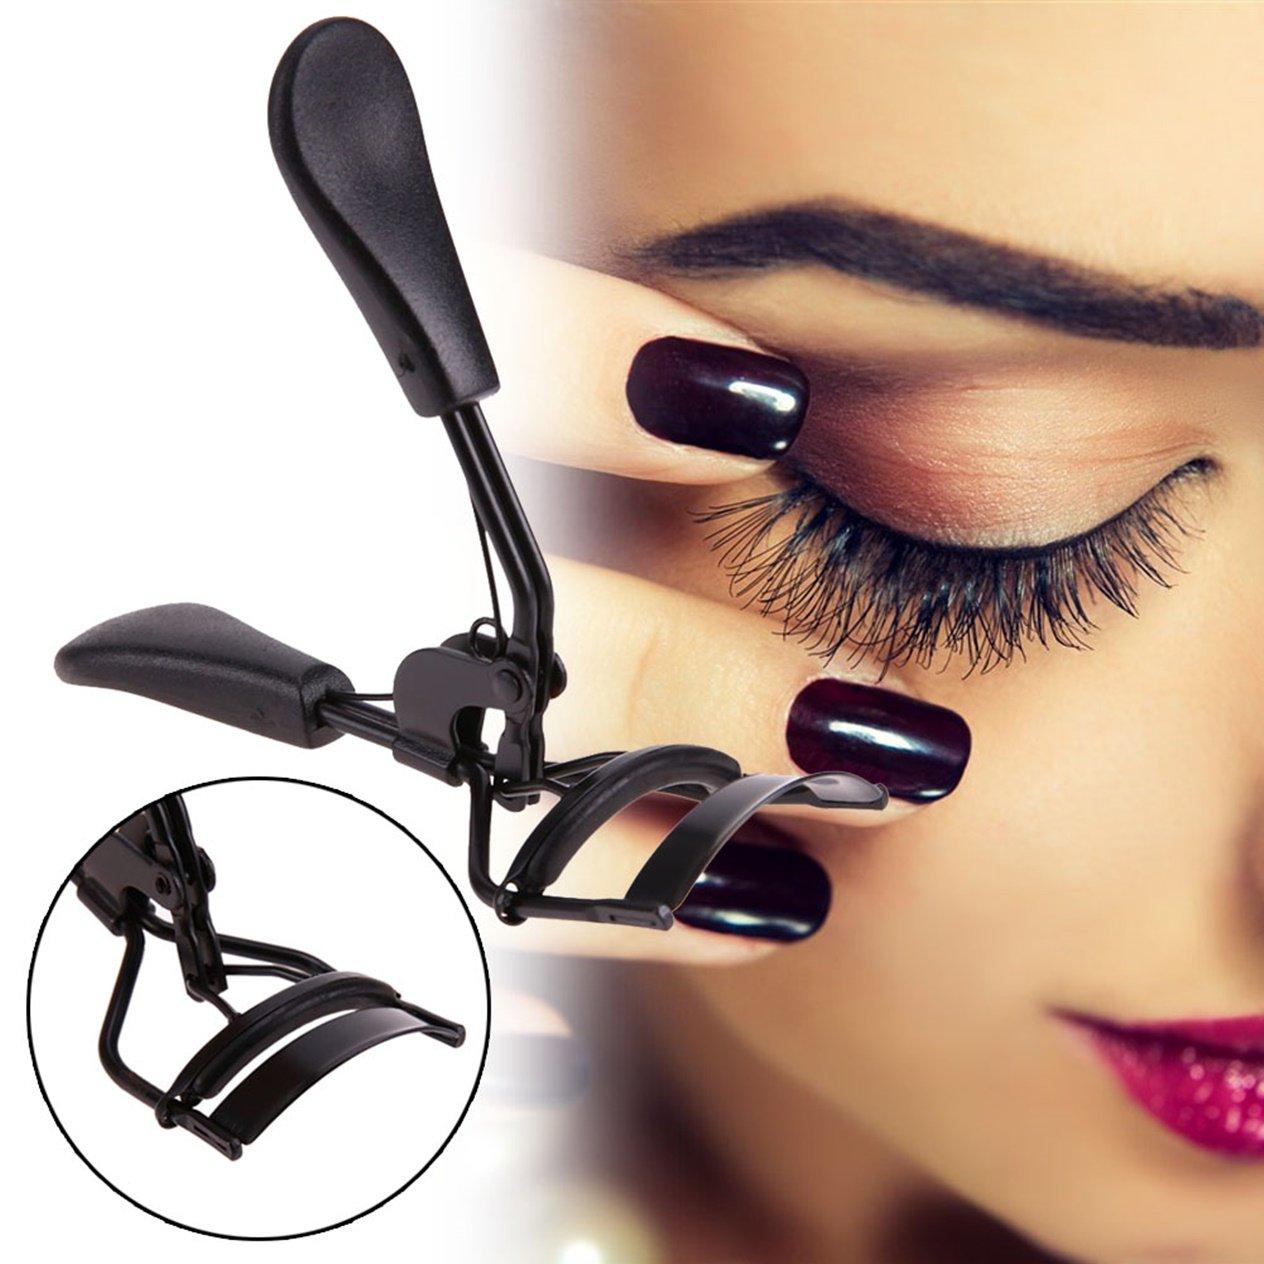 Amazon 1 Set Eyelash Curlers Eye Makeup Curler Curling Natural